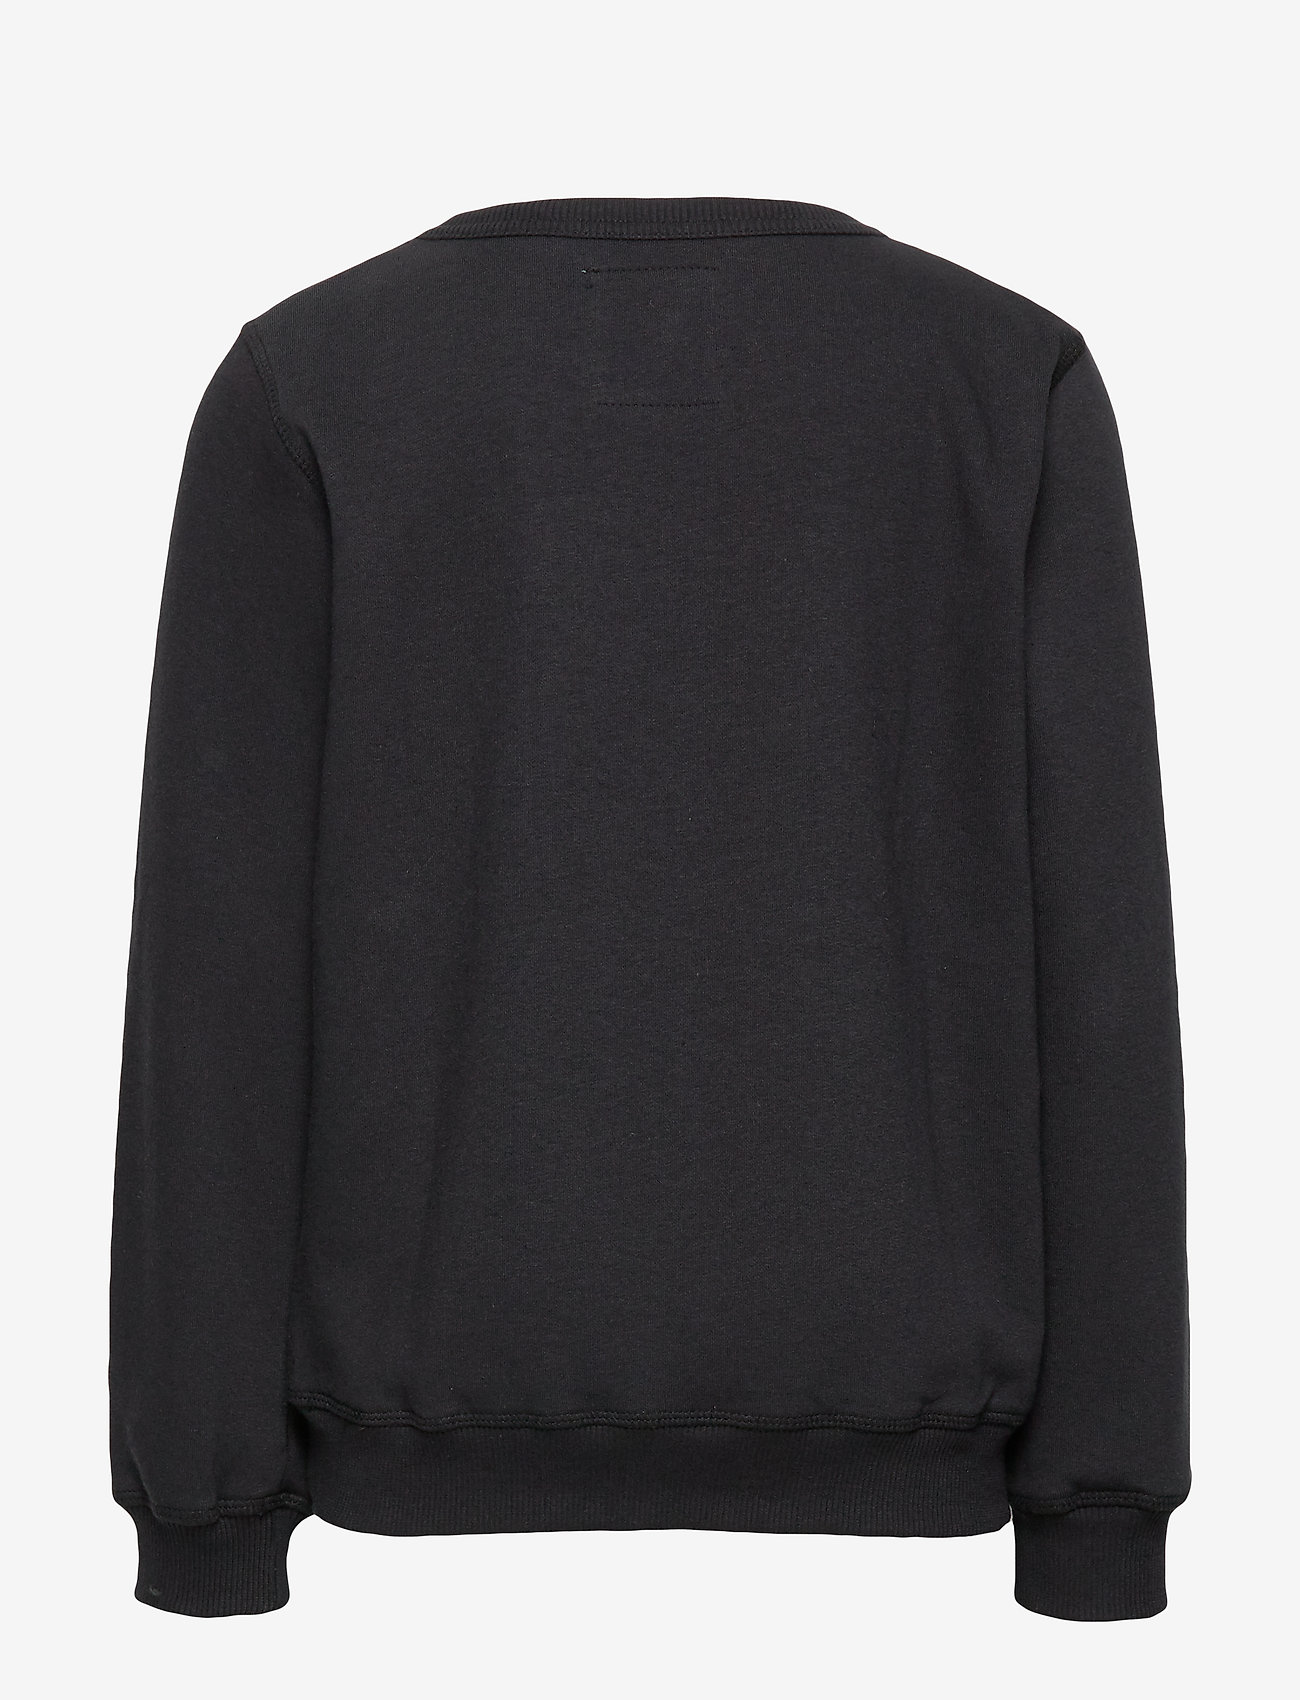 Levi's - SWEAT SHIRT - sweatshirts - noir - 1